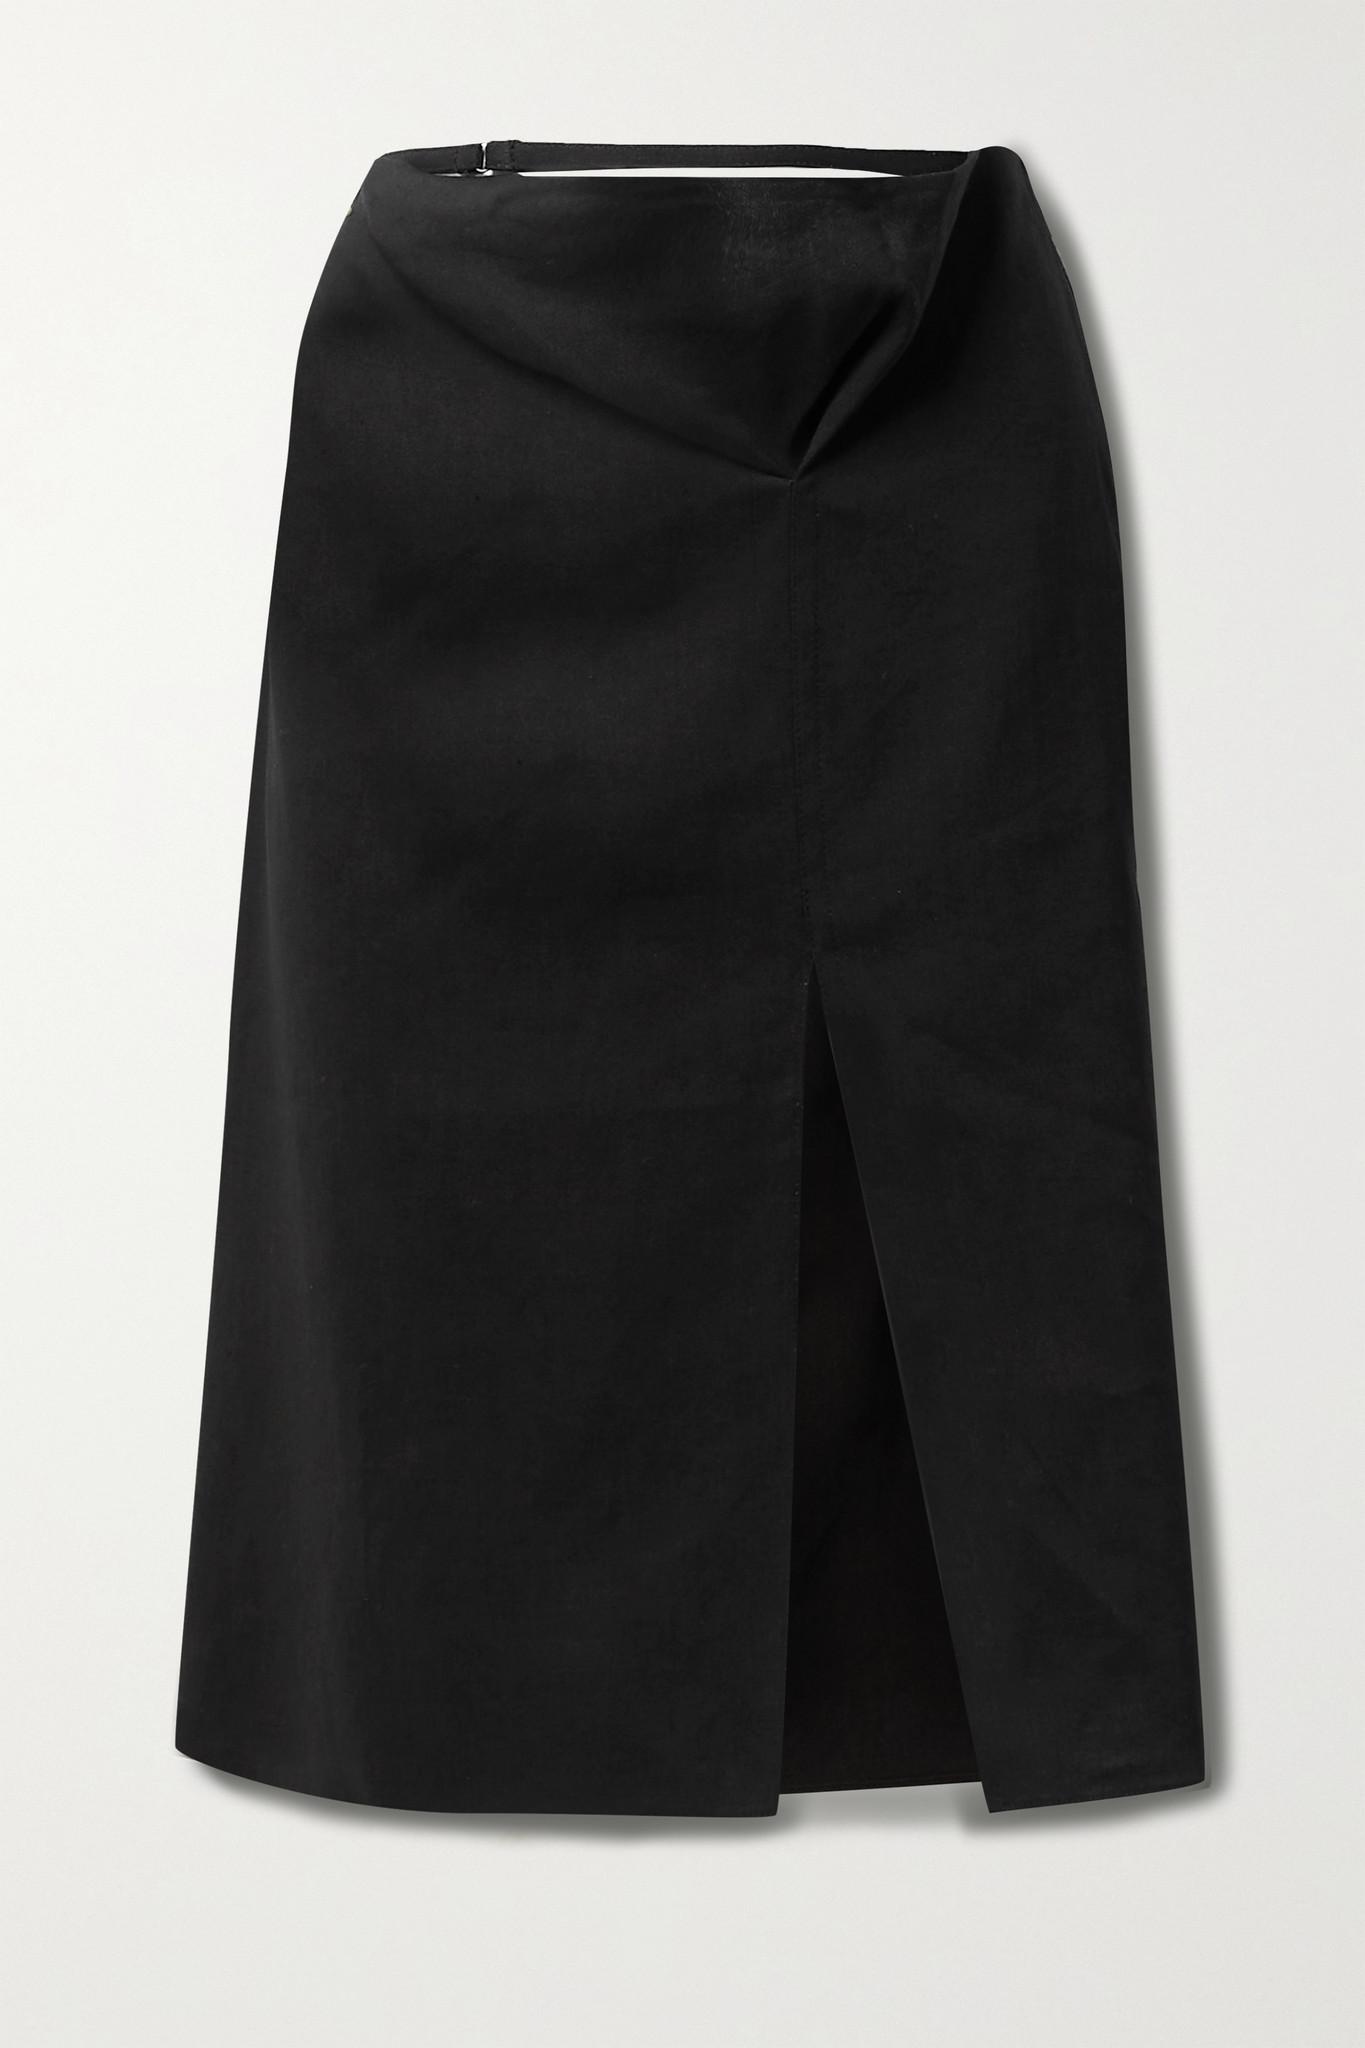 JACQUEMUS - 挖剪汉麻混纺半身裙 - 黑色 - FR36